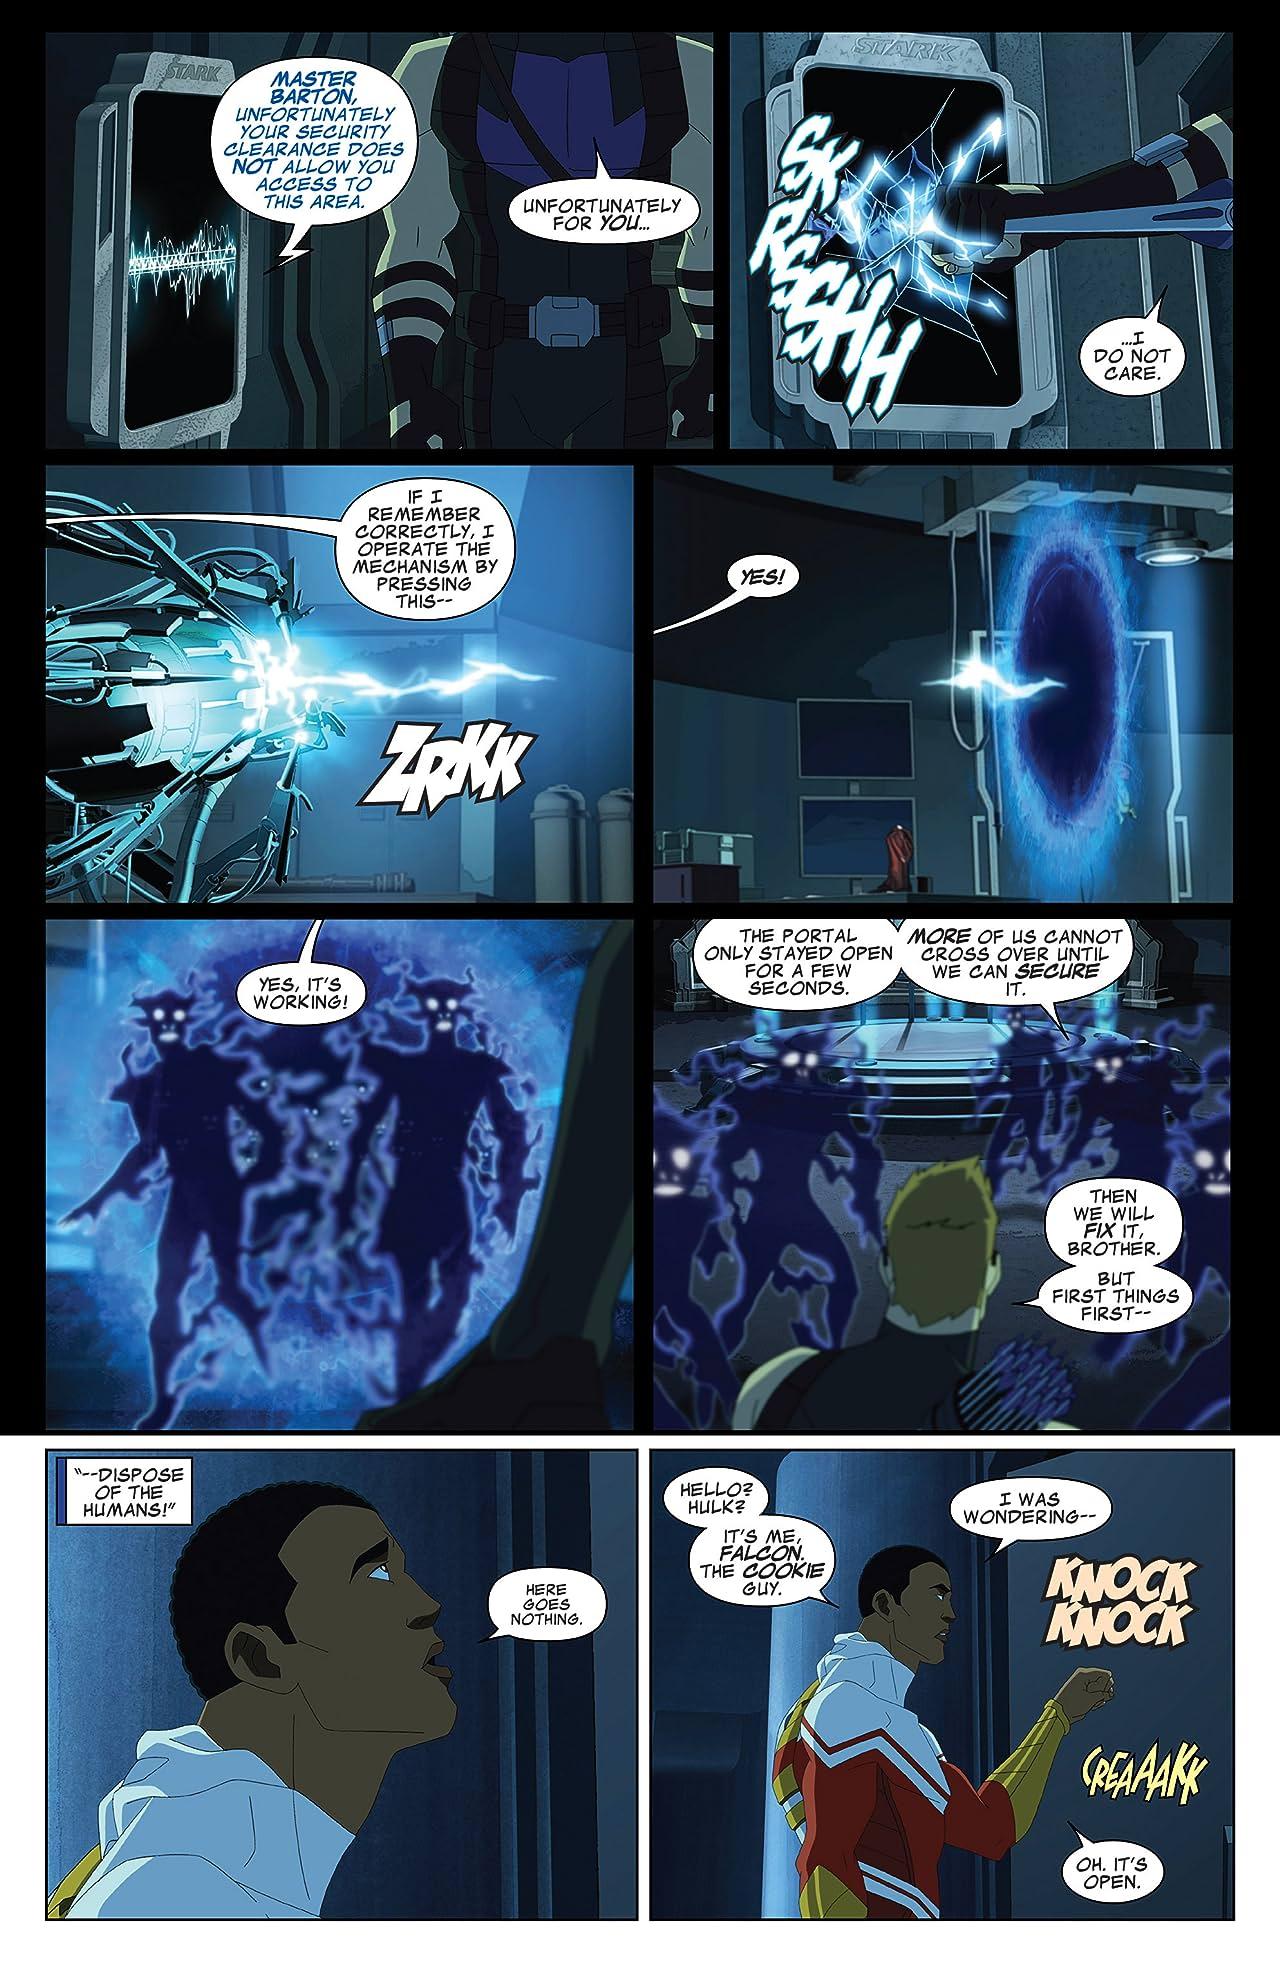 Marvel Universe Avengers Assemble (2013-2014) #3